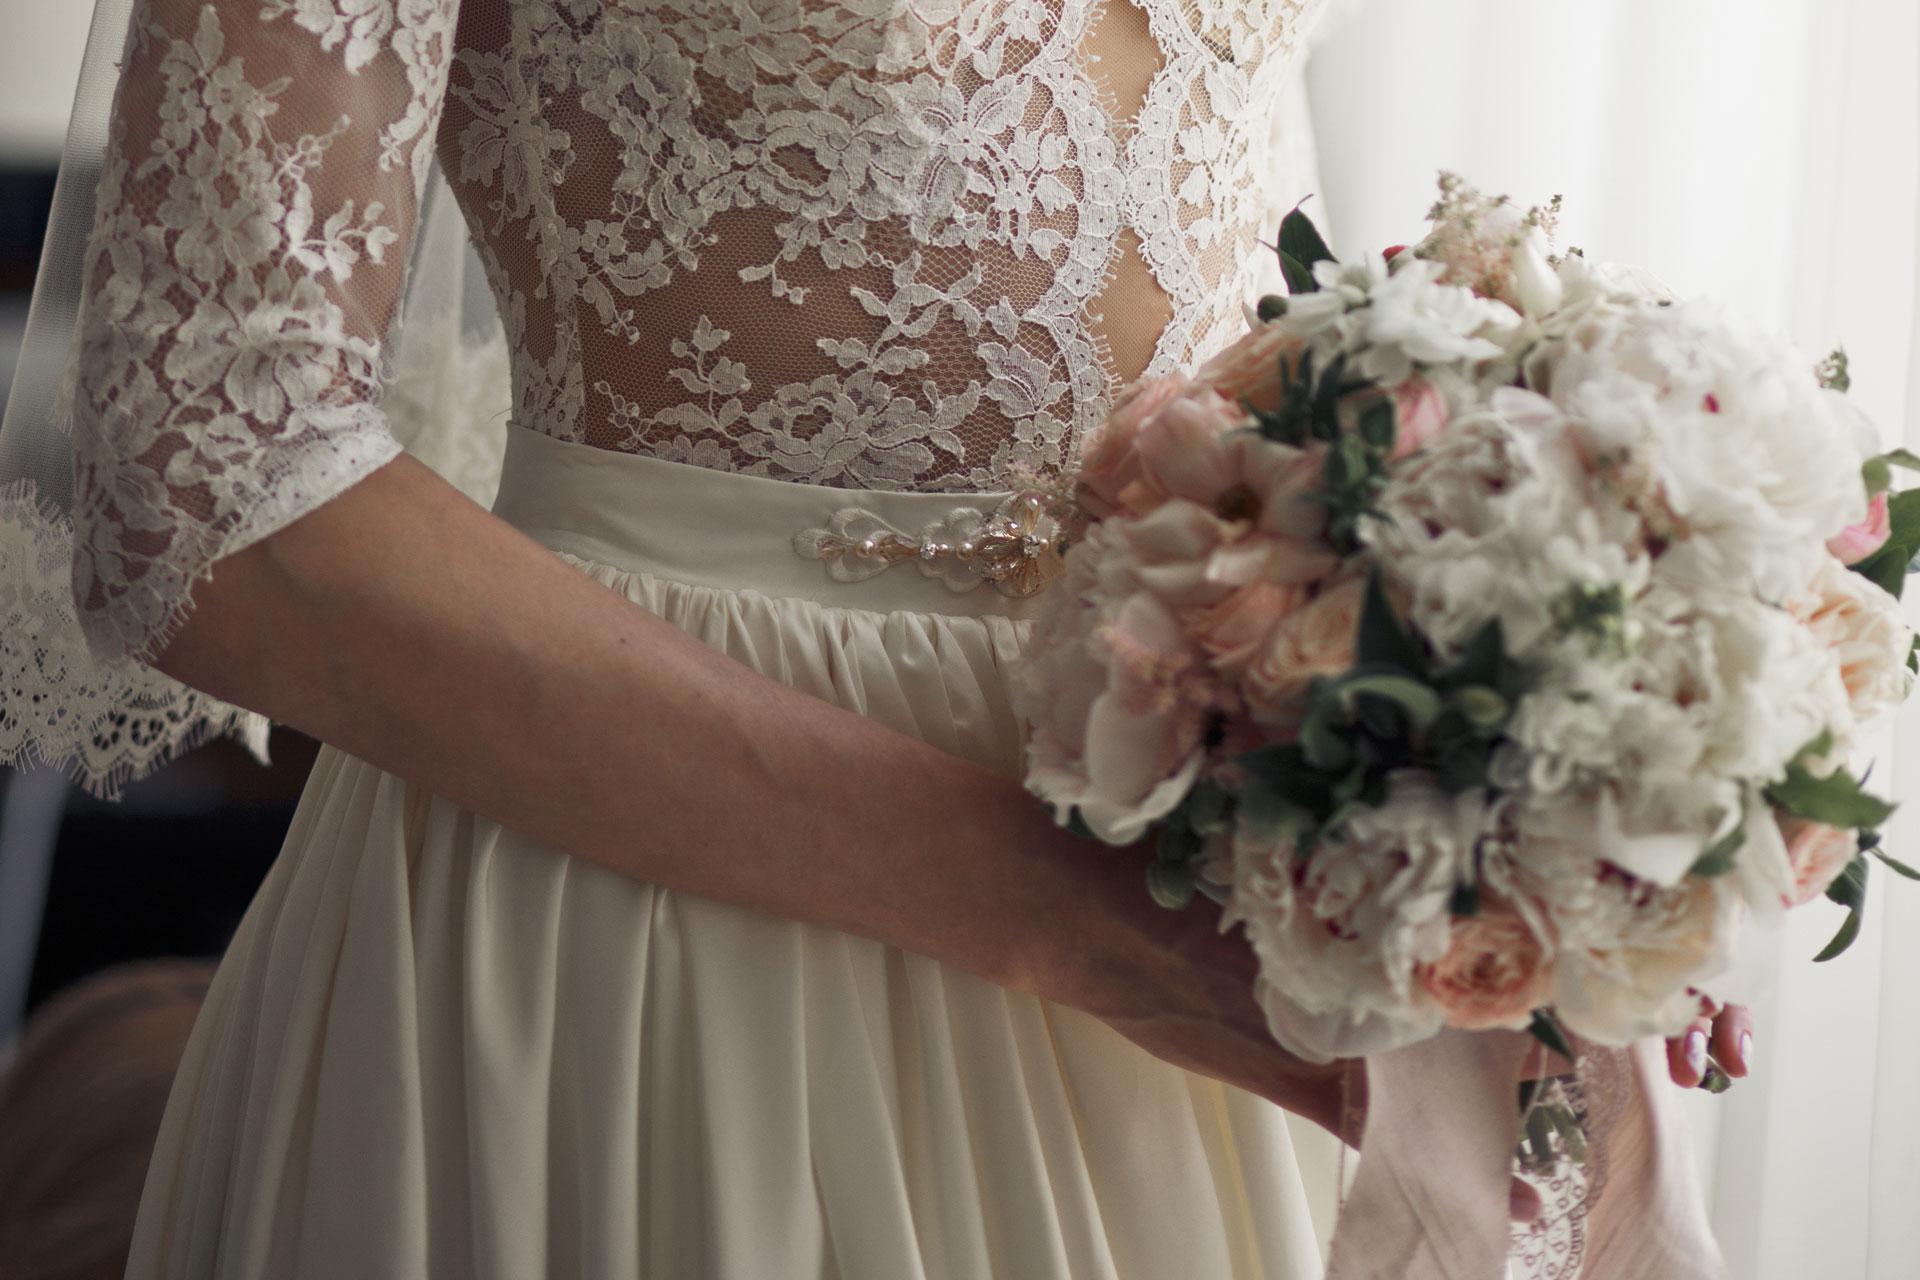 Вишневый сад. Свадьба Валентина Кротова и Натальи Ходуновой фото 10